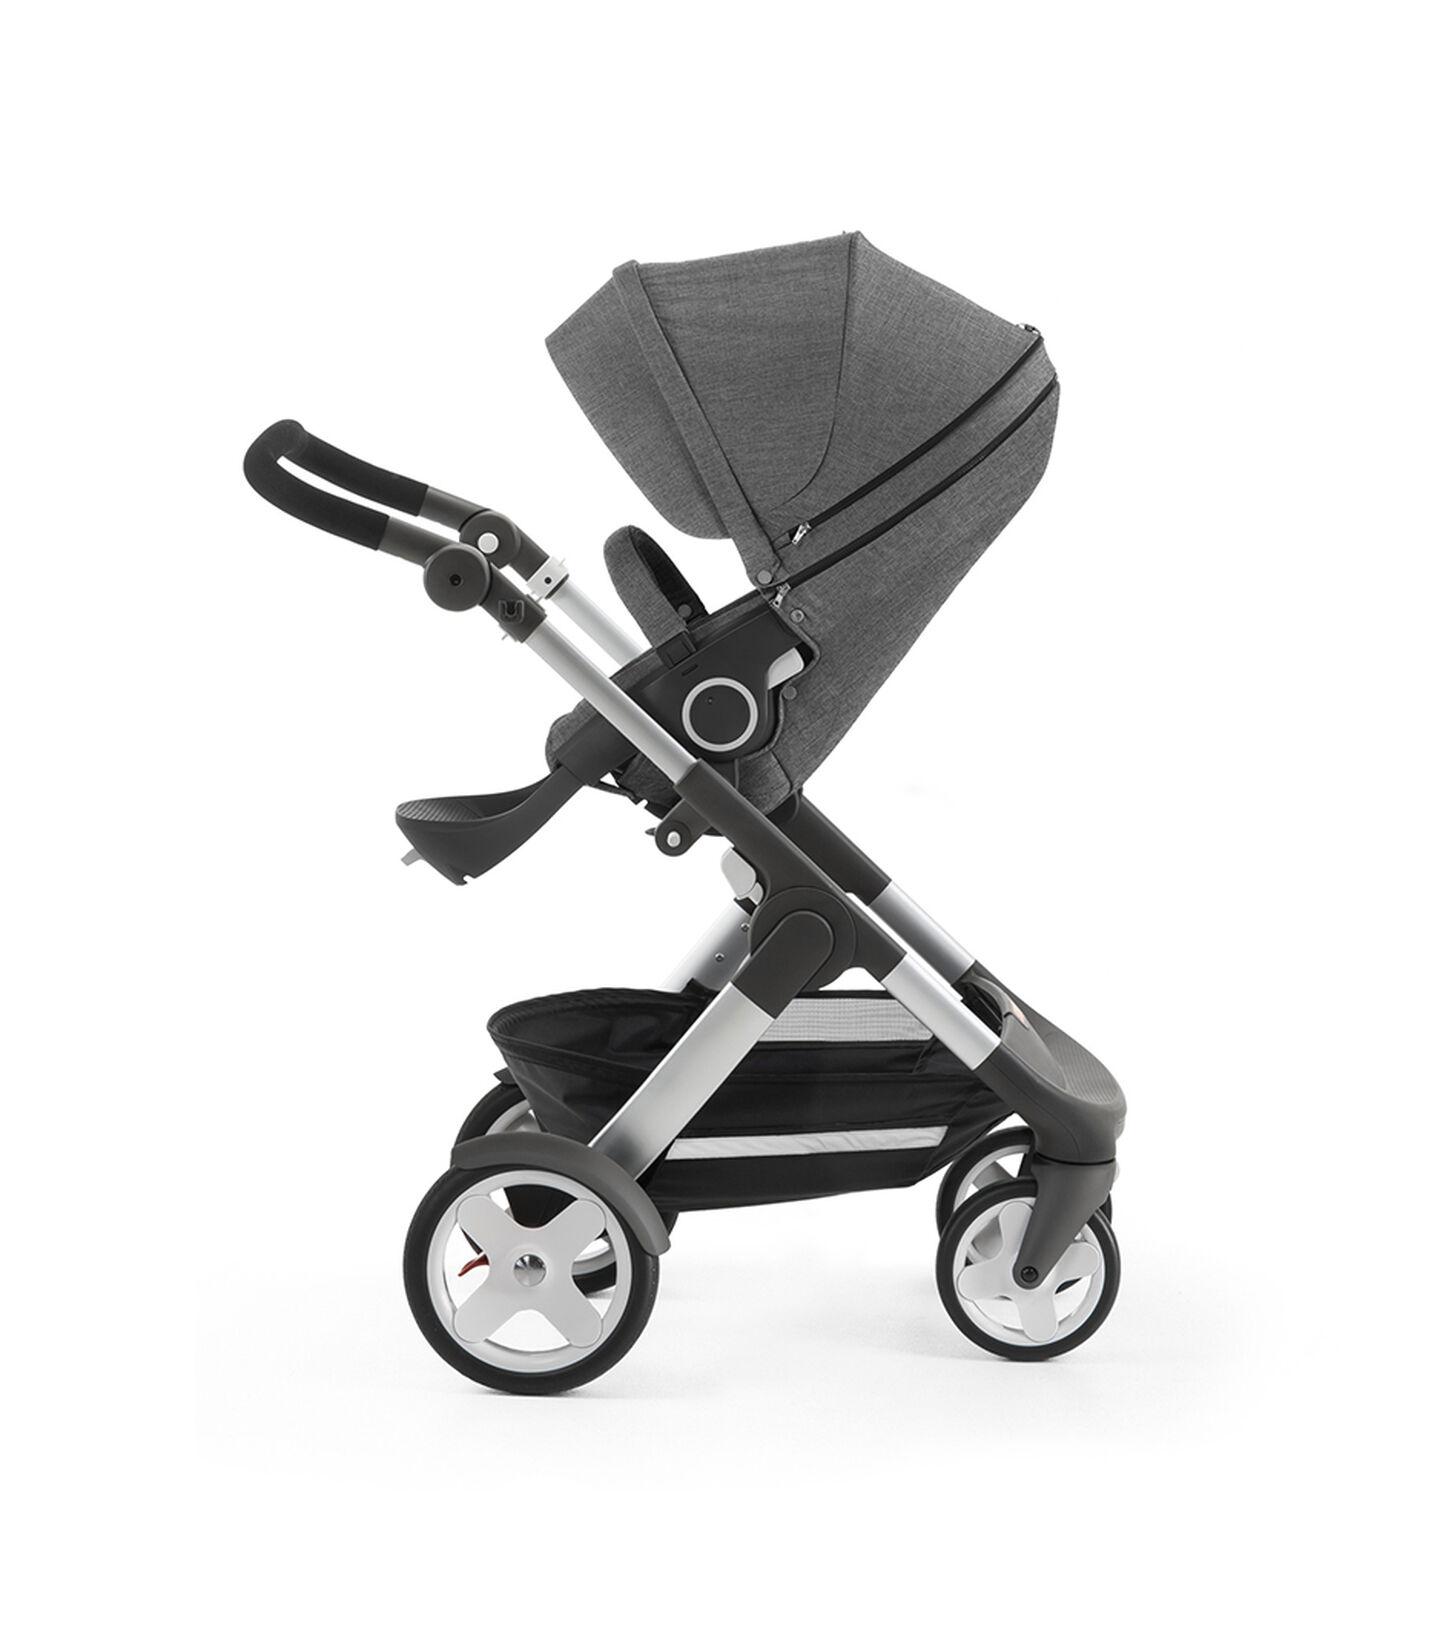 Stokke® Trailz™ with Stokke® Stroller Seat, Black Melange. Classic Wheels. view 2